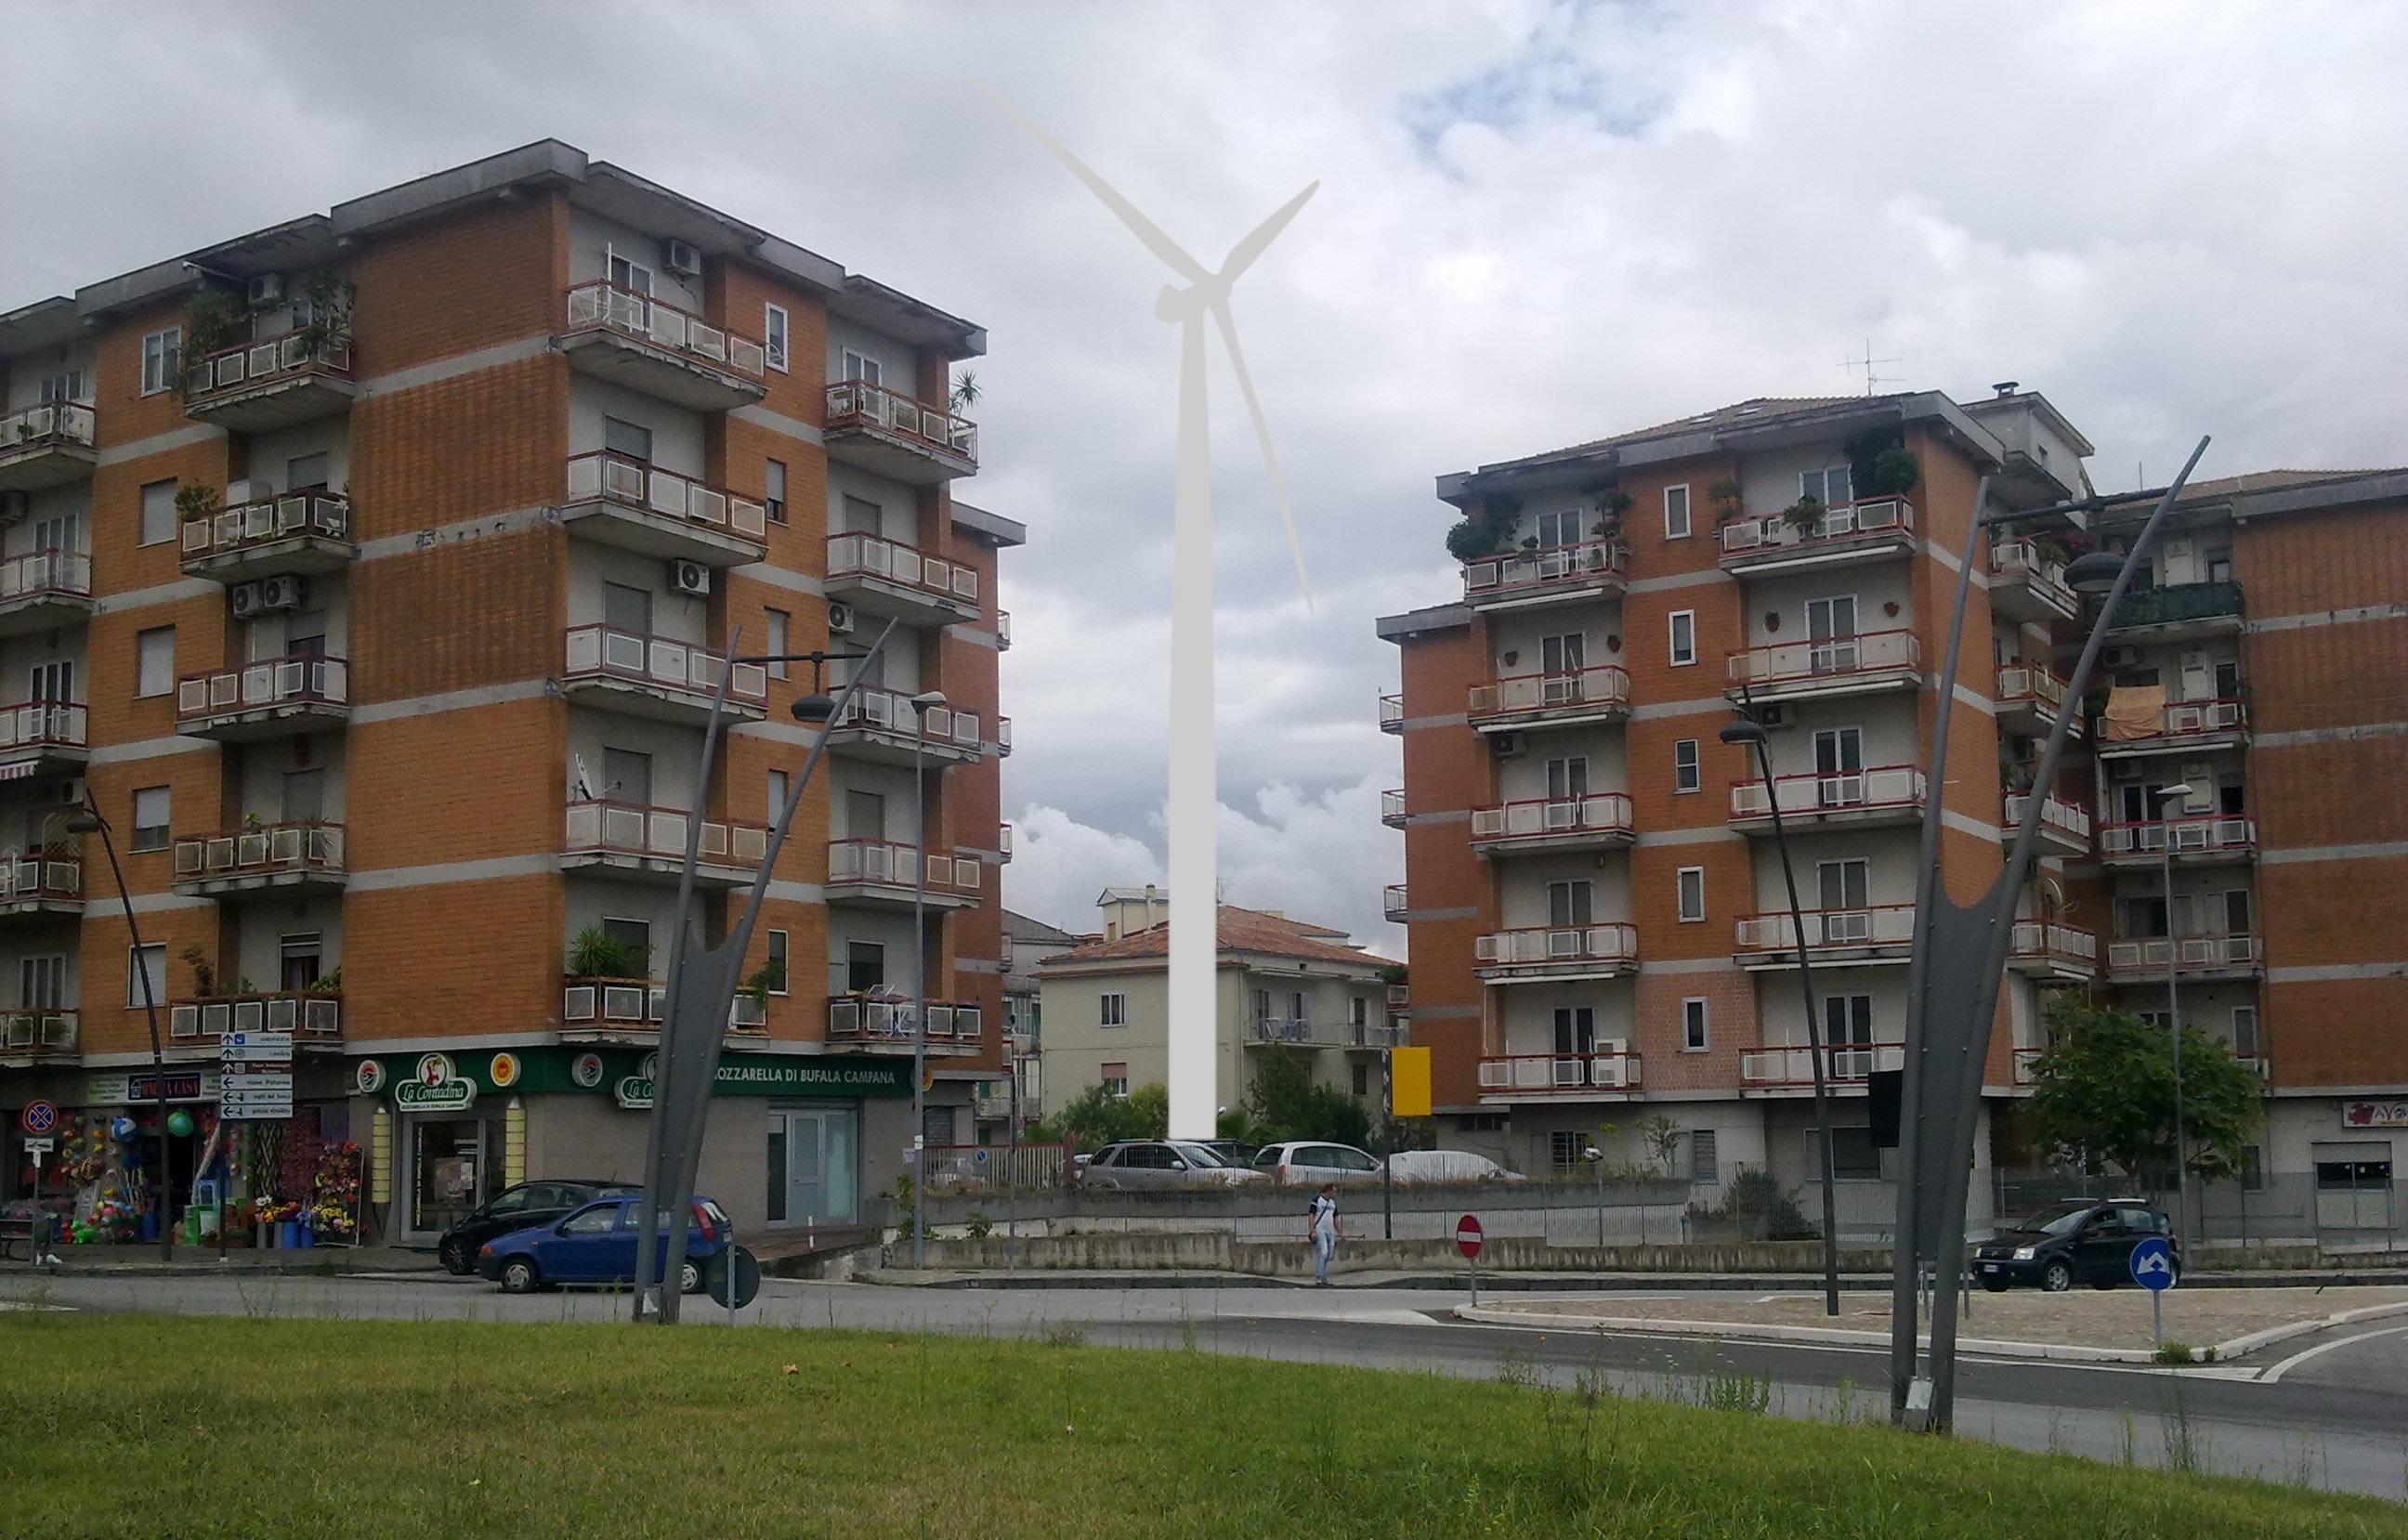 E tra i palazzi spunta l autorizzazione di una pala eolica for Palazzi di una storia